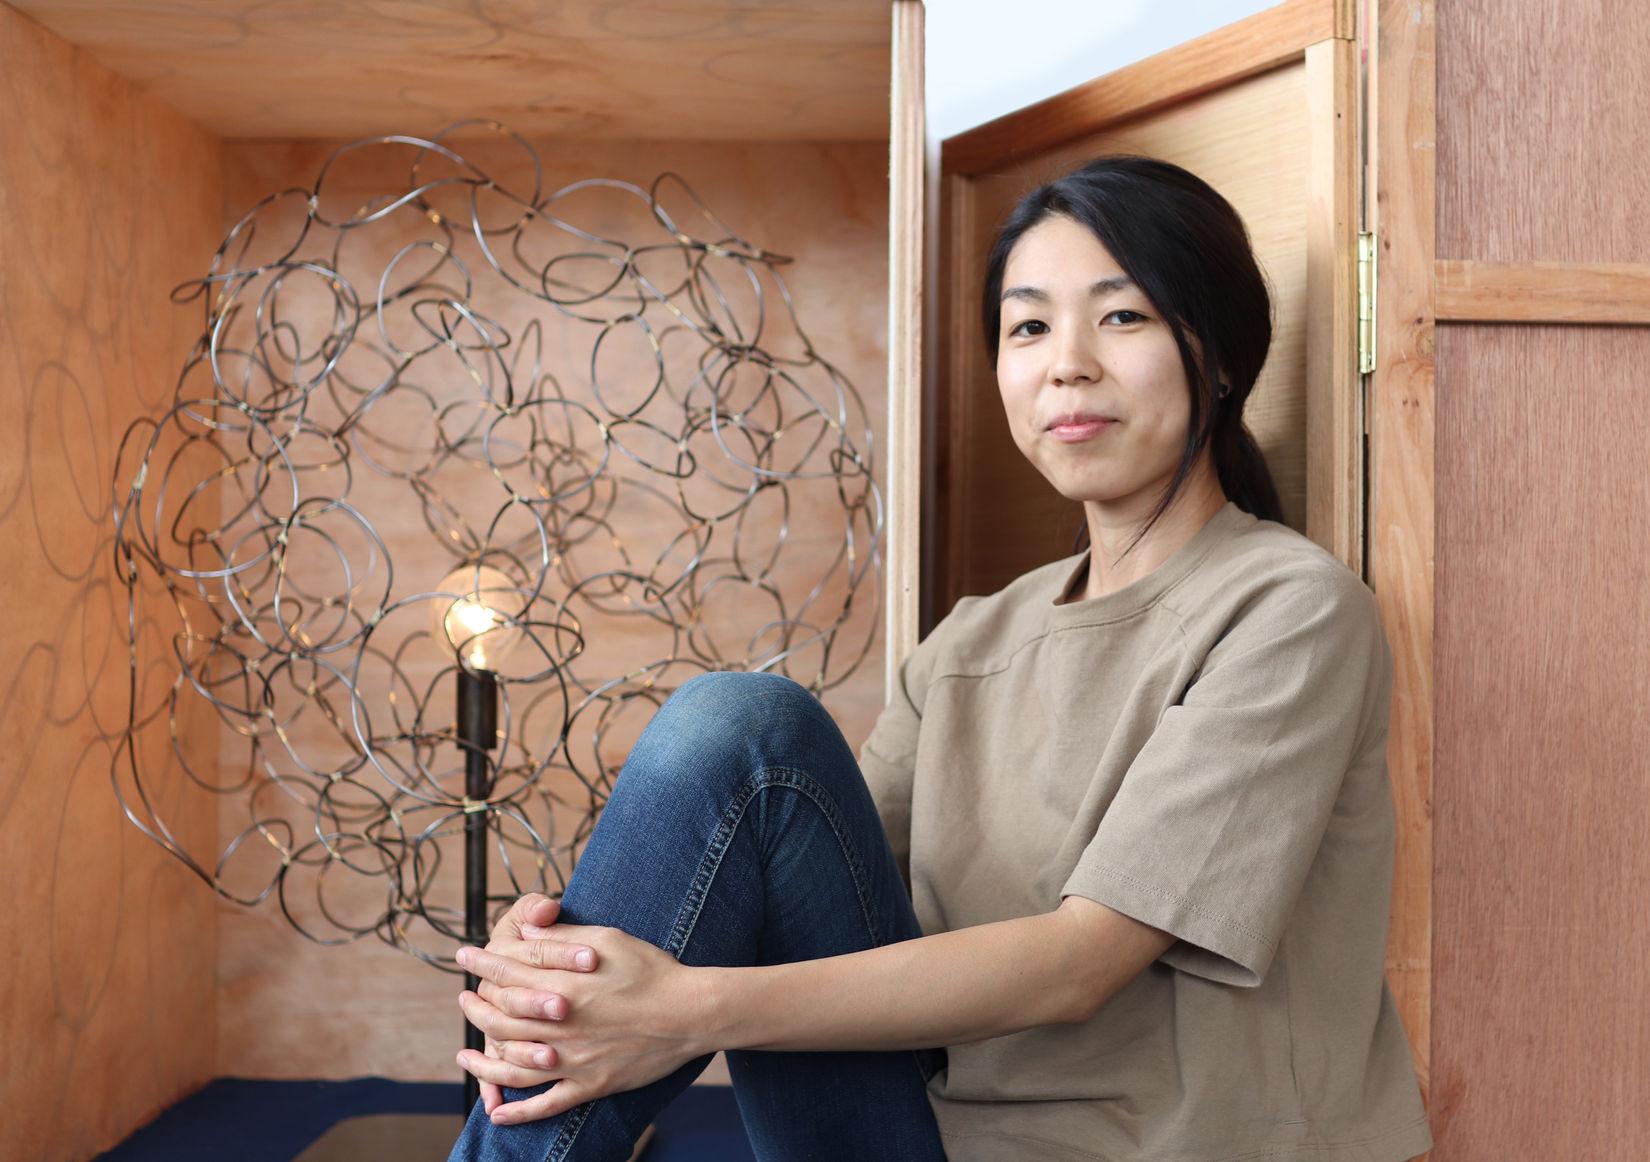 On The Rise: Ayako Aratani & Embracing Imperfection